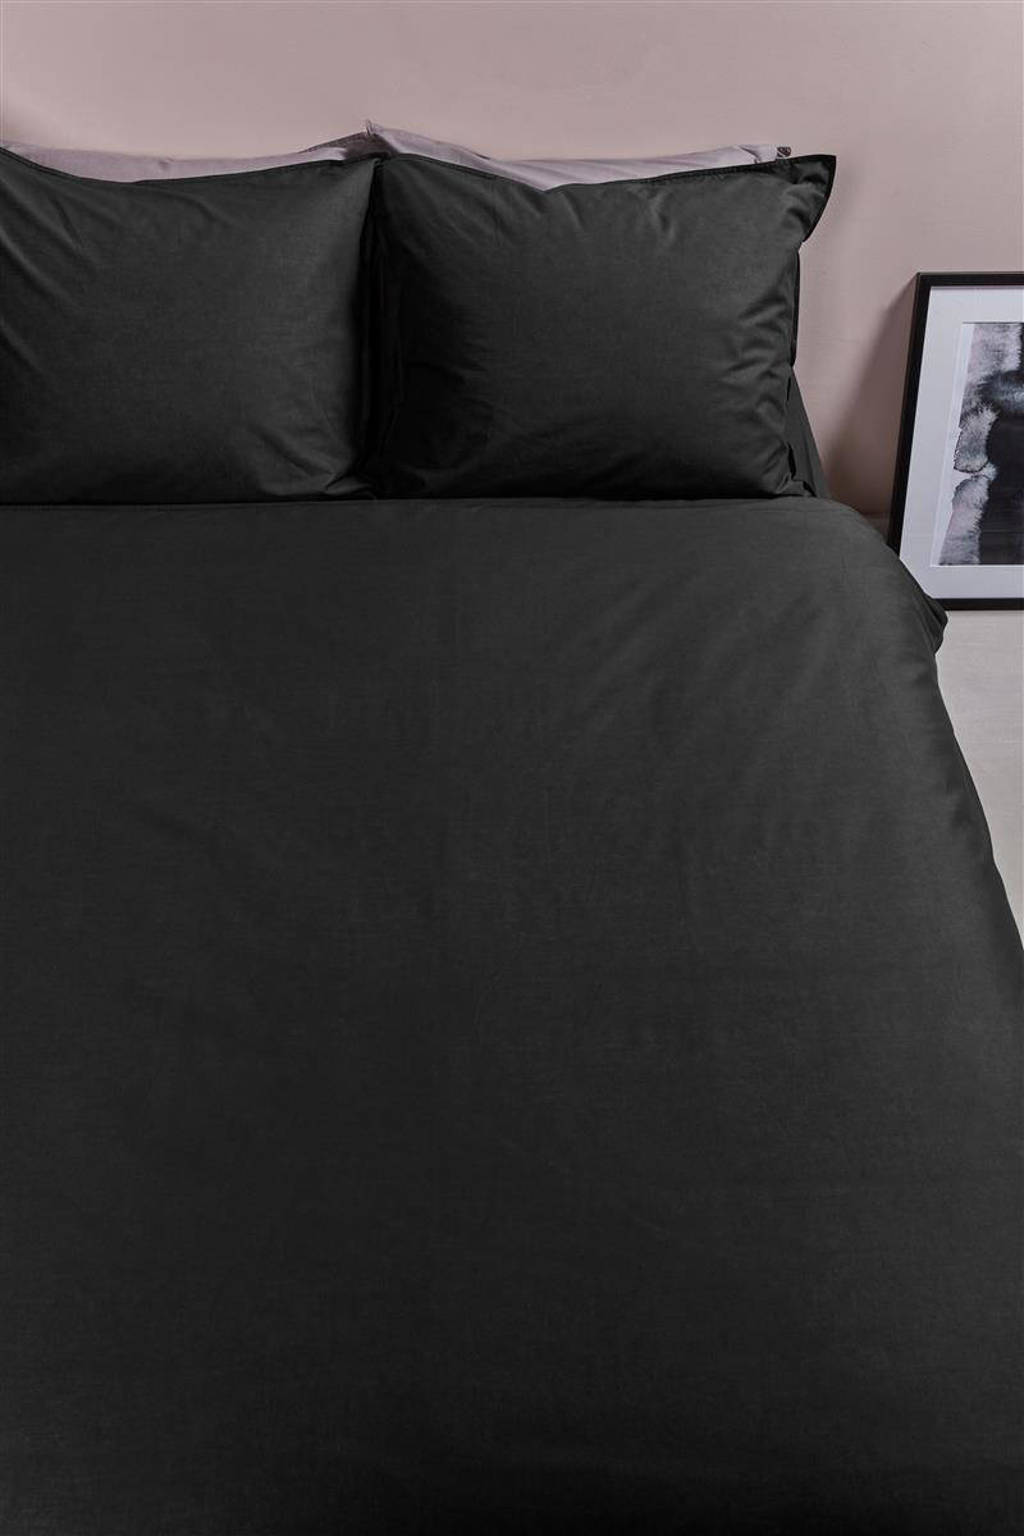 Ambiante katoenen dekbedovertrek lits-jumeaux, Zwart